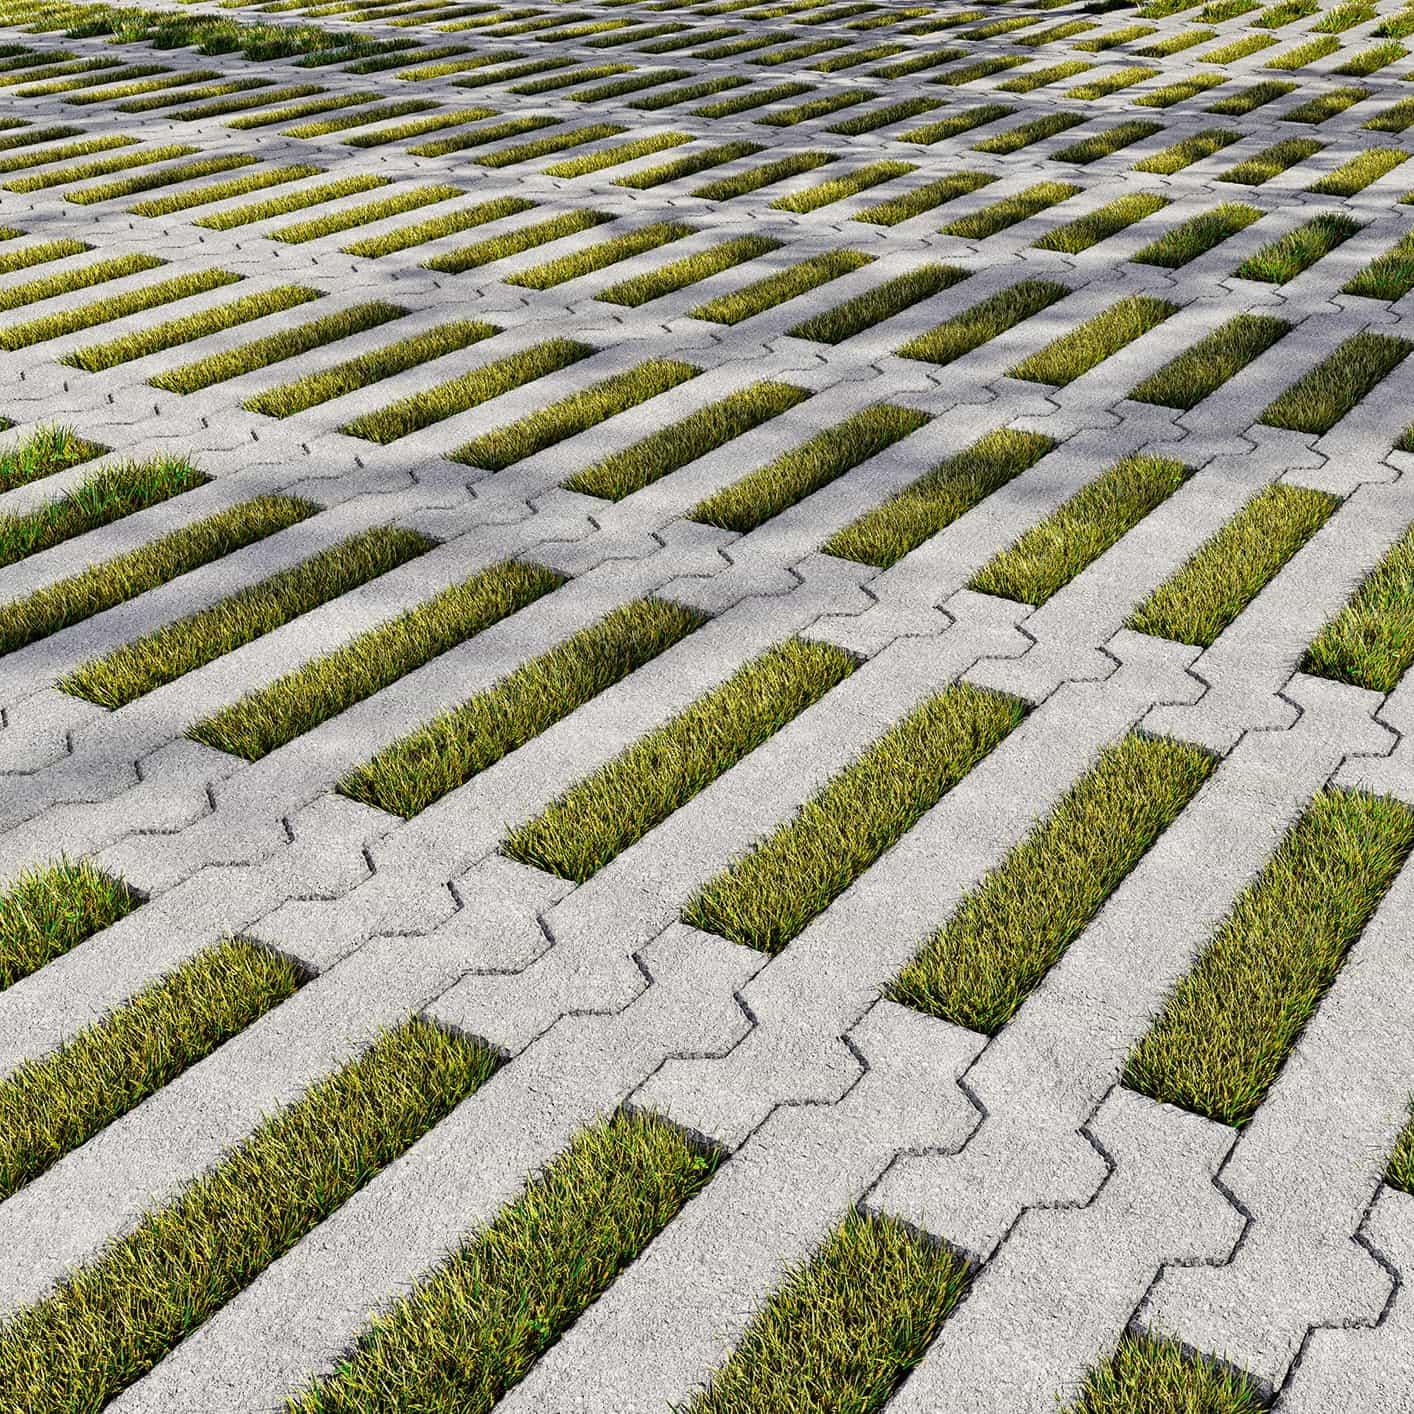 Grass cover Grids